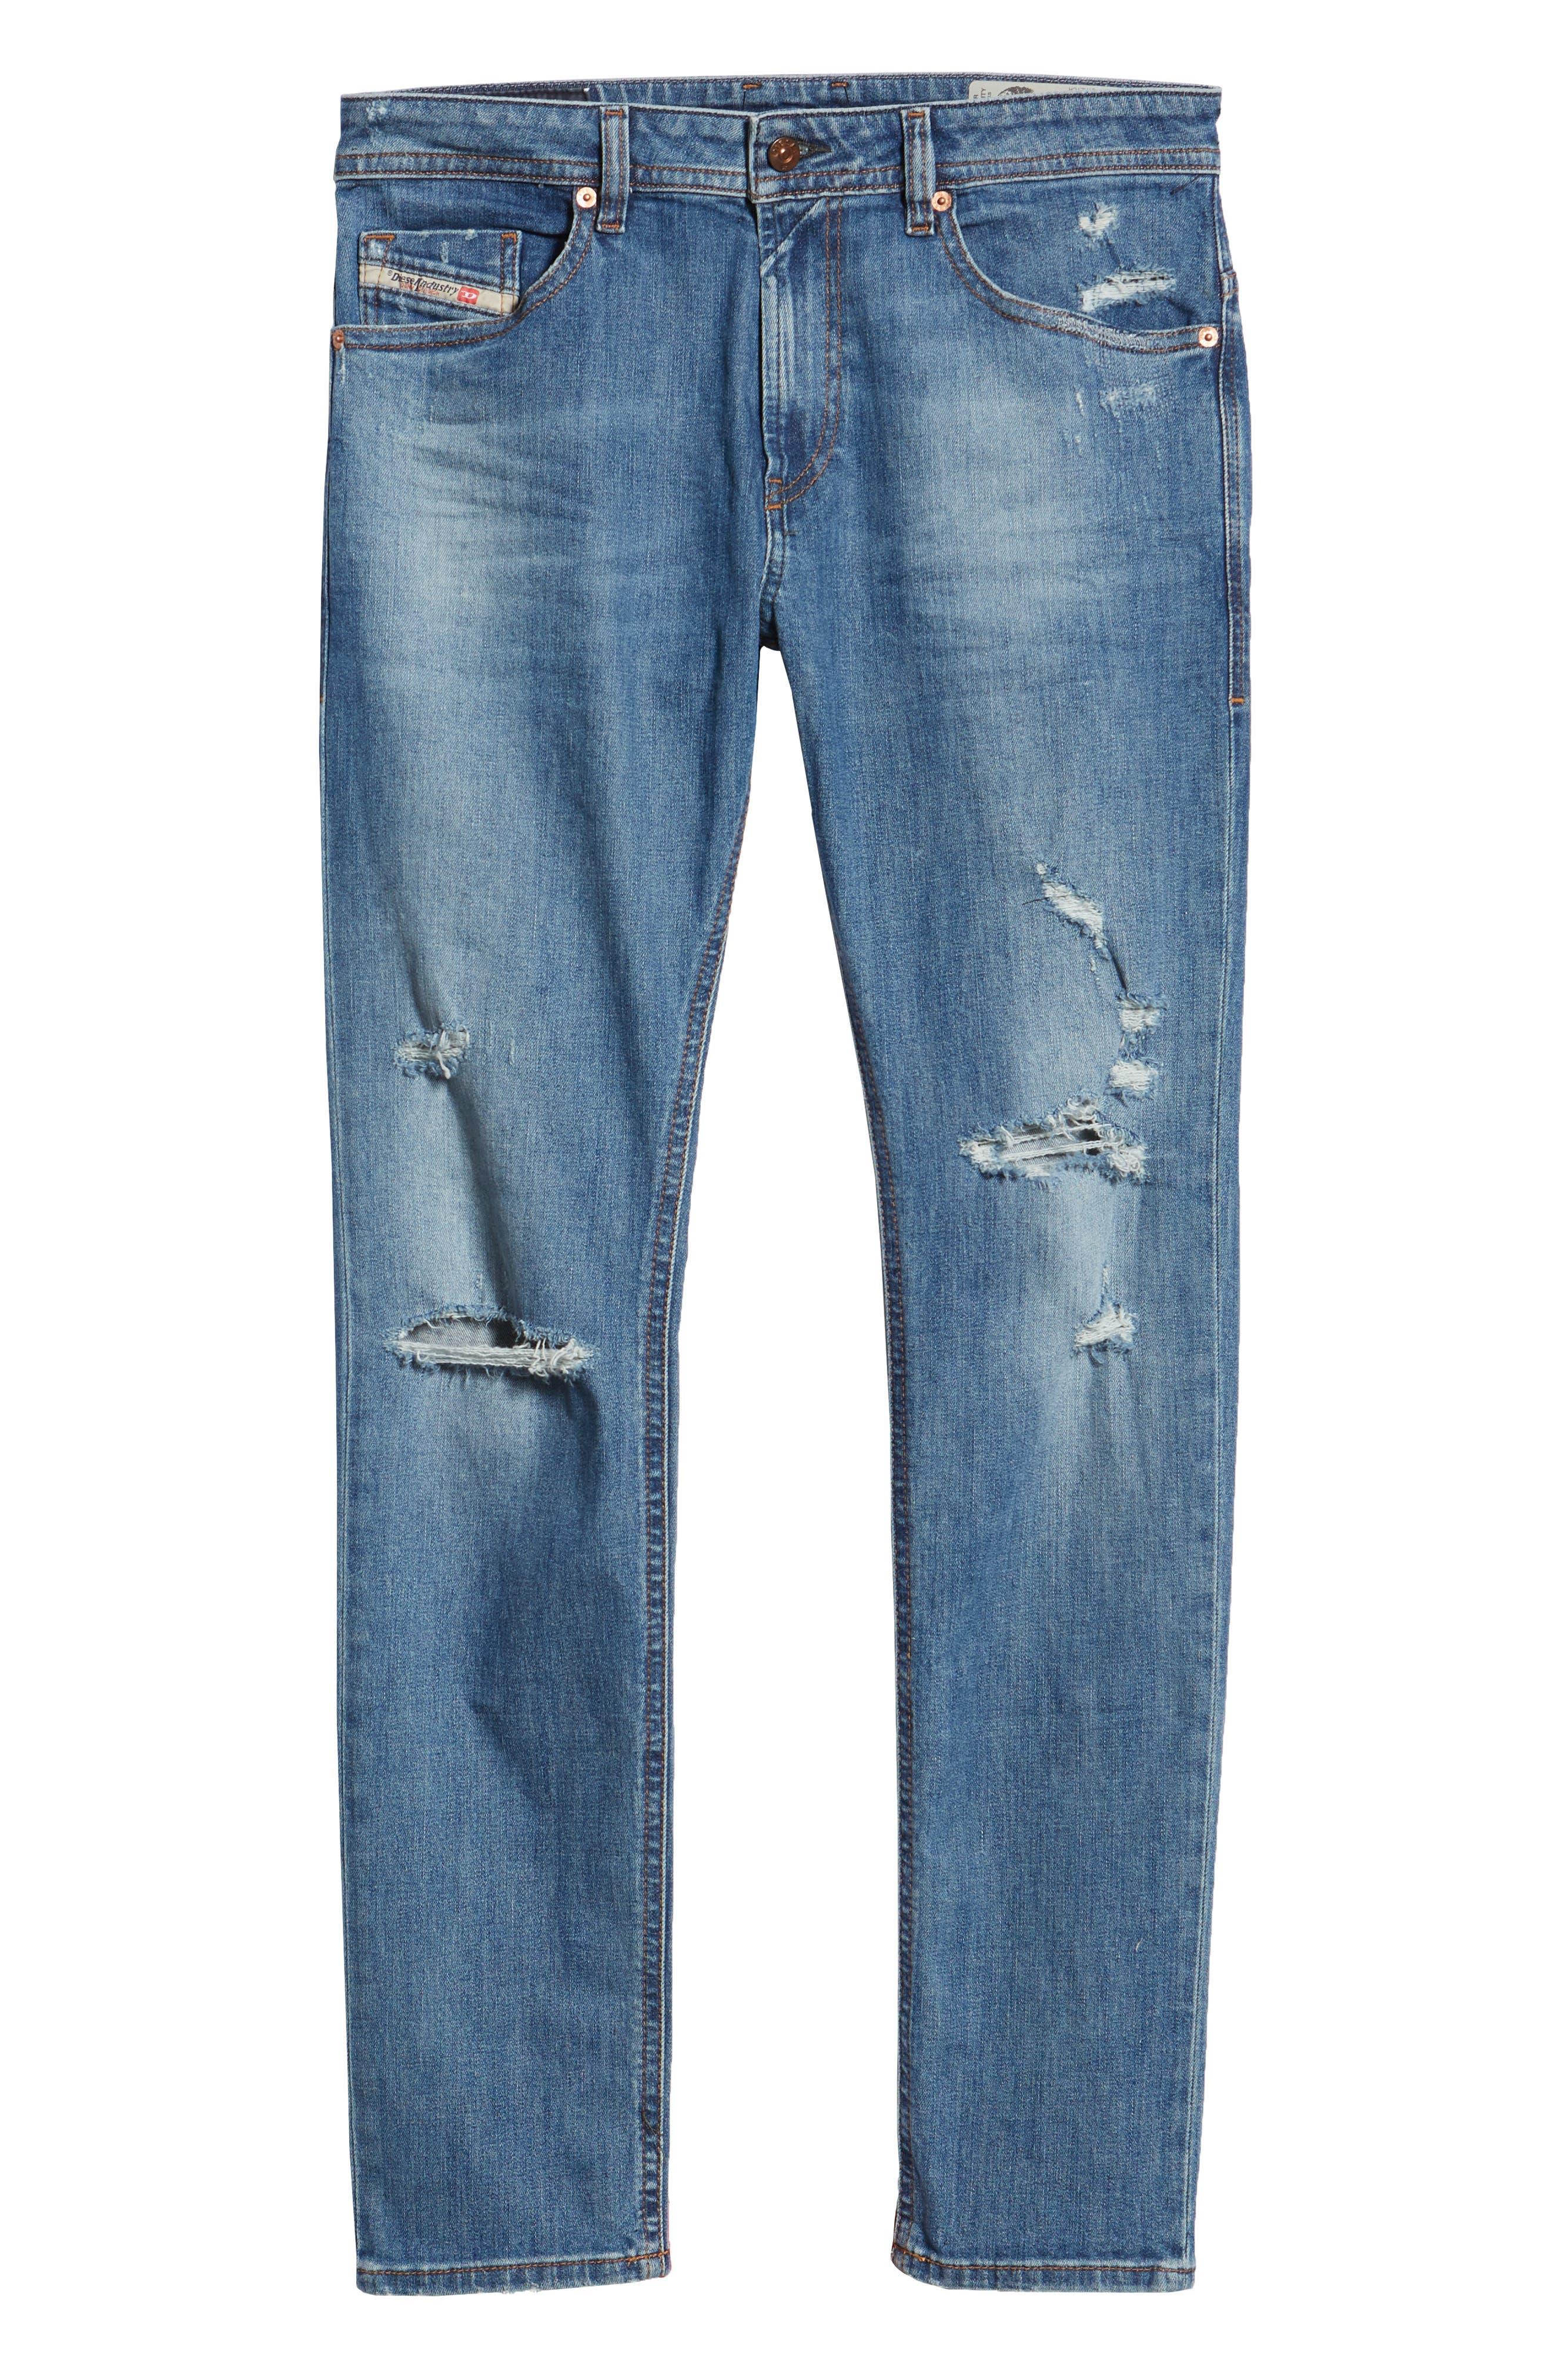 Thommer Skinny Fit Jeans,                             Alternate thumbnail 6, color,                             CN011